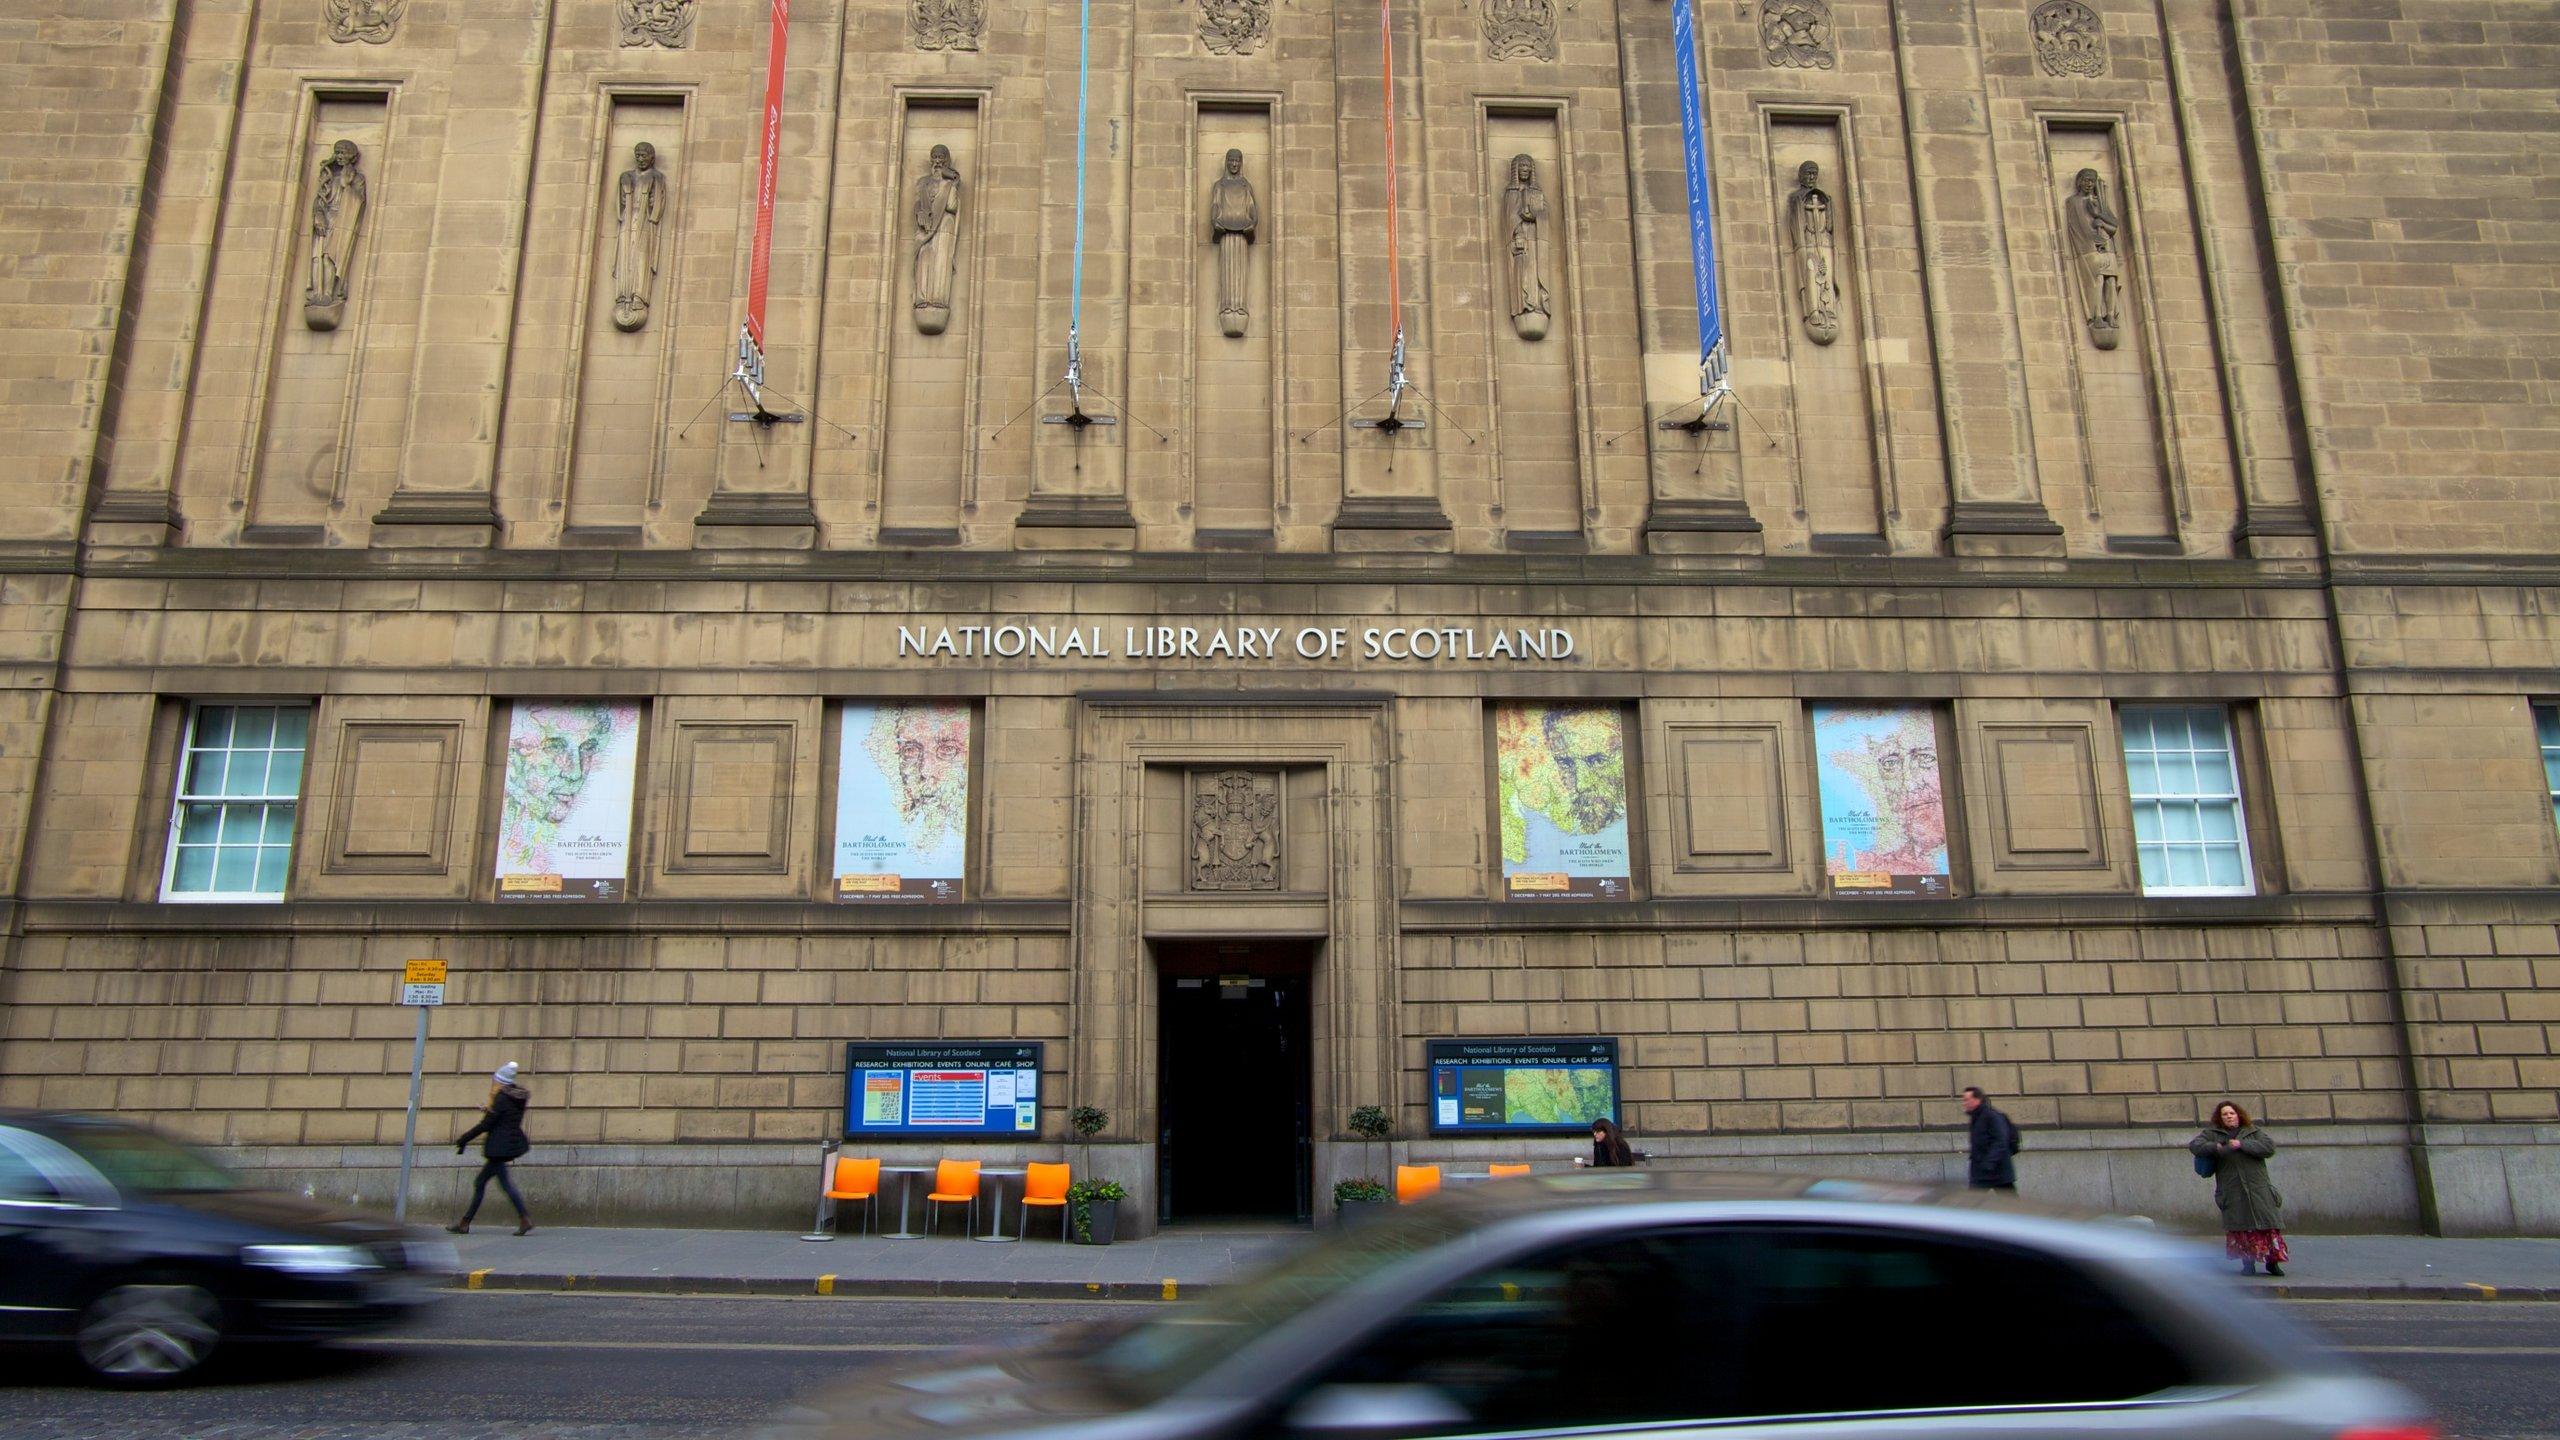 National Library of Scotland, Edinburgh, Scotland, United Kingdom